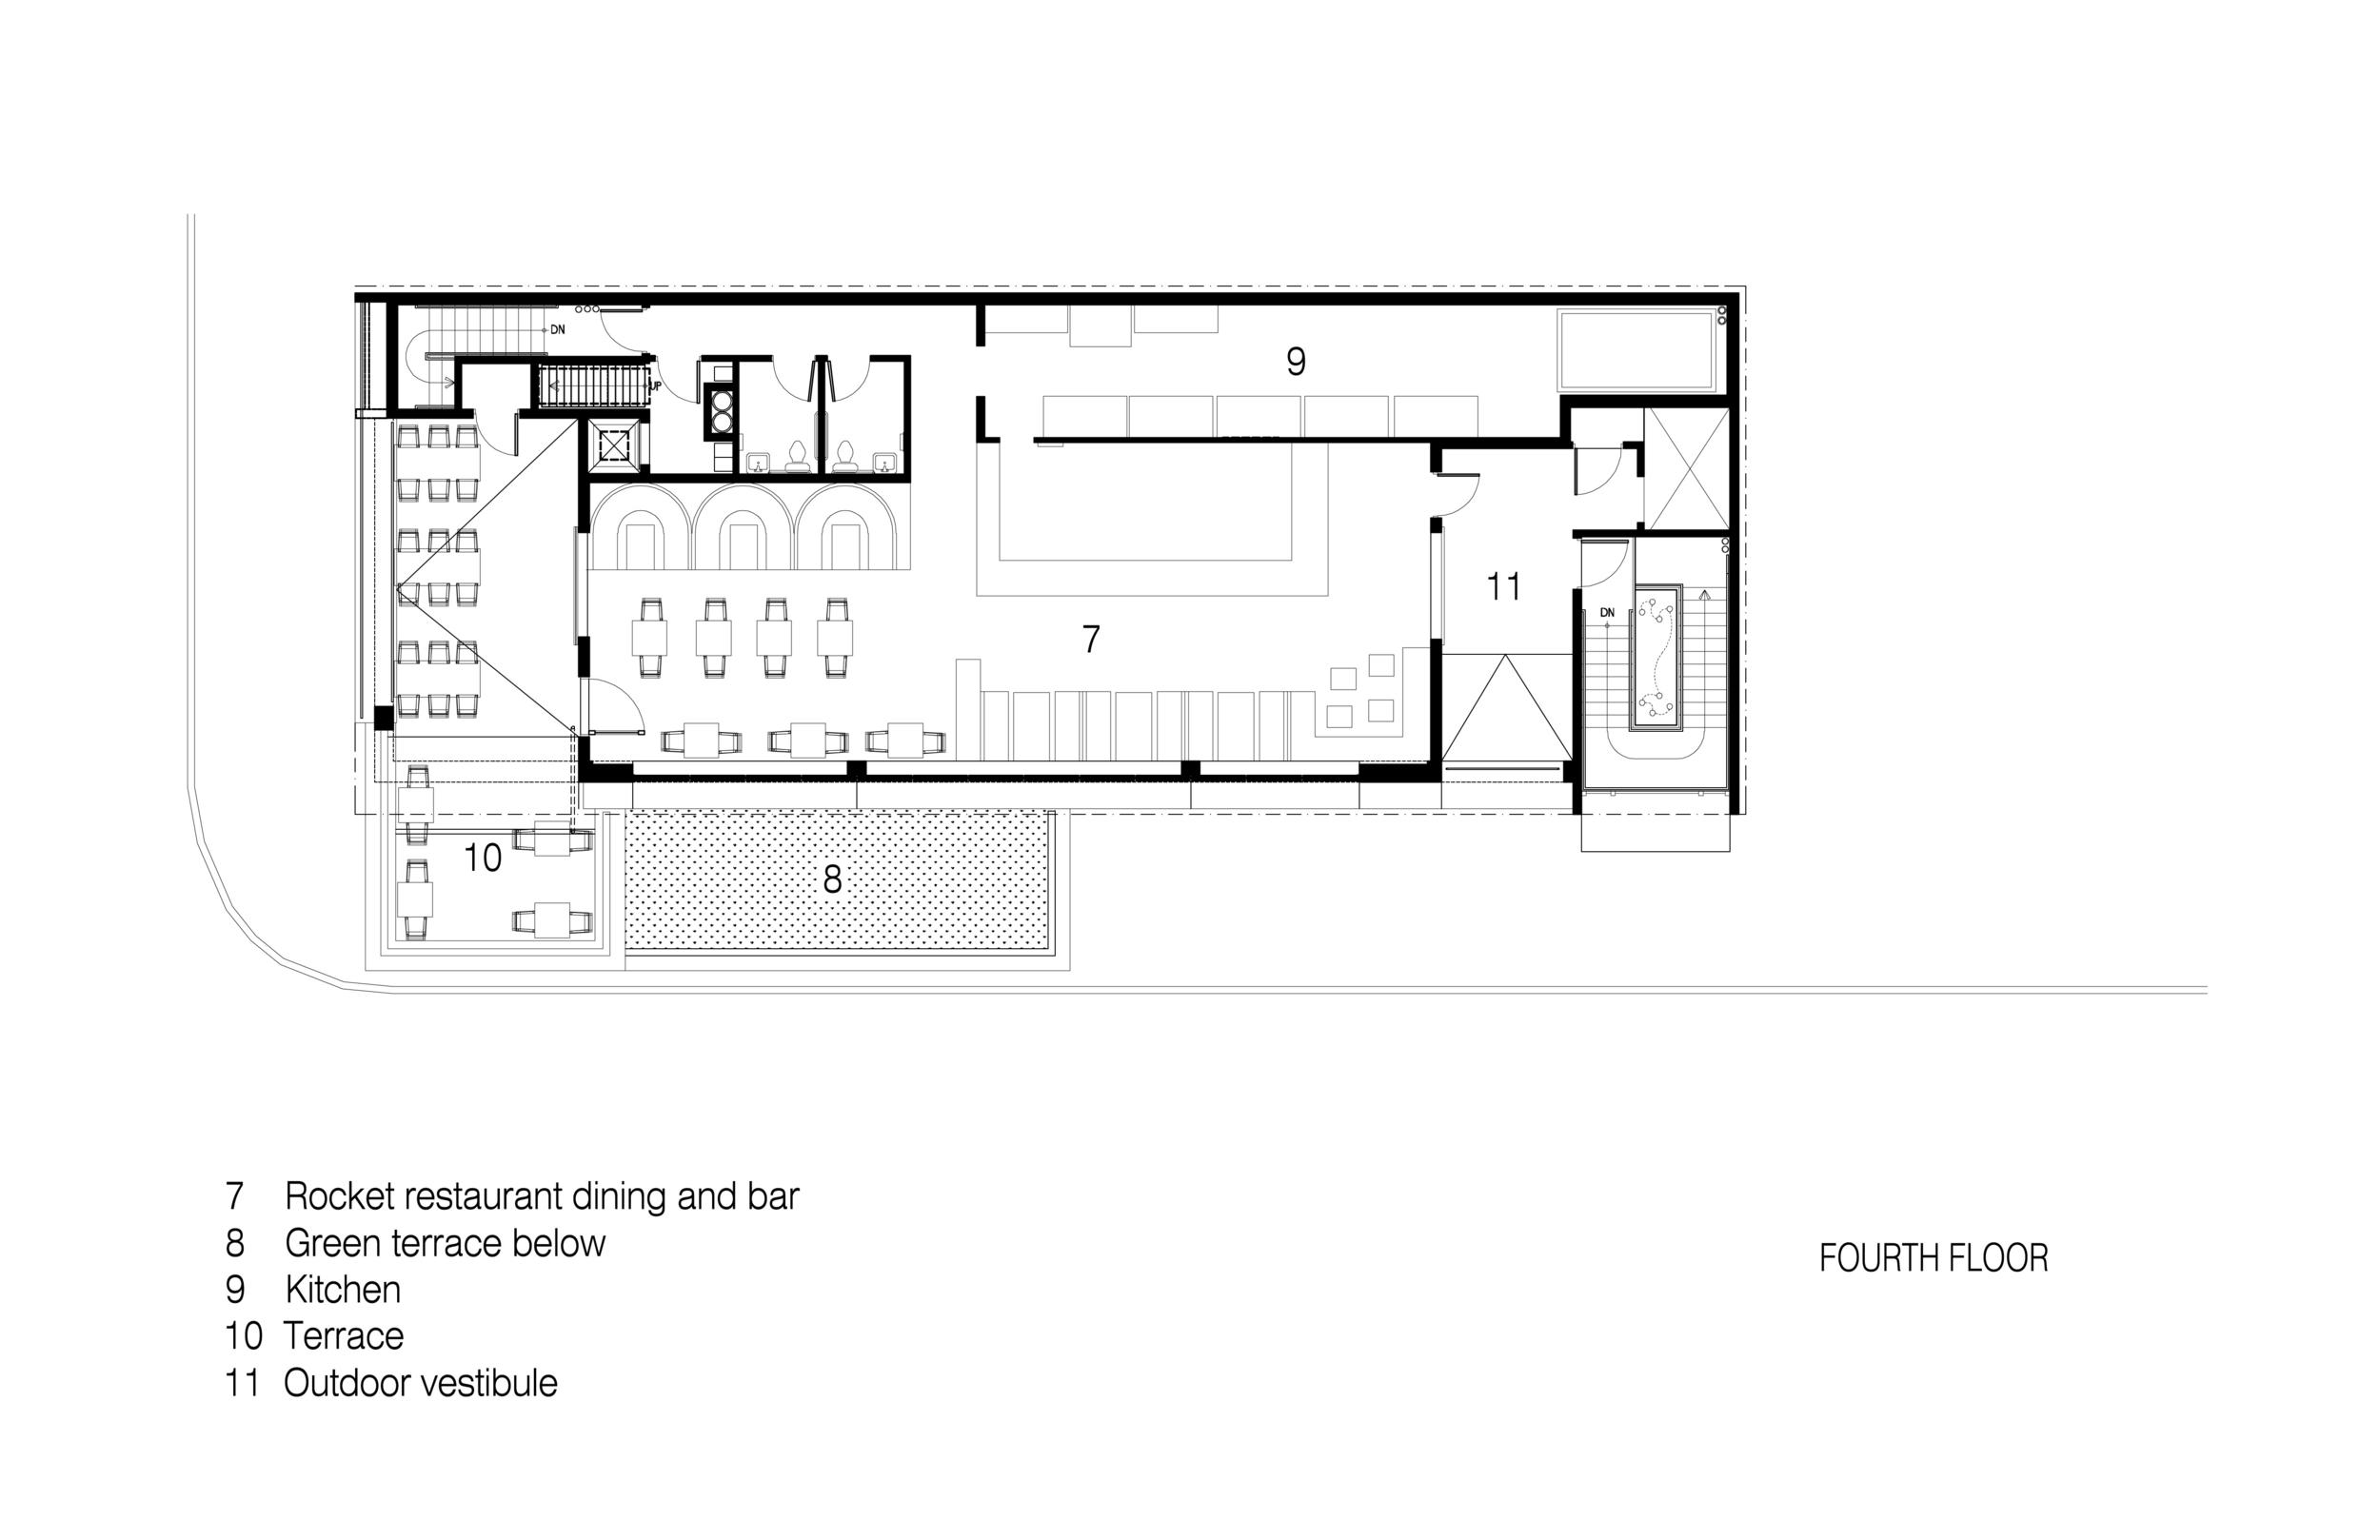 BSR-Plan_FourthFloor.jpg